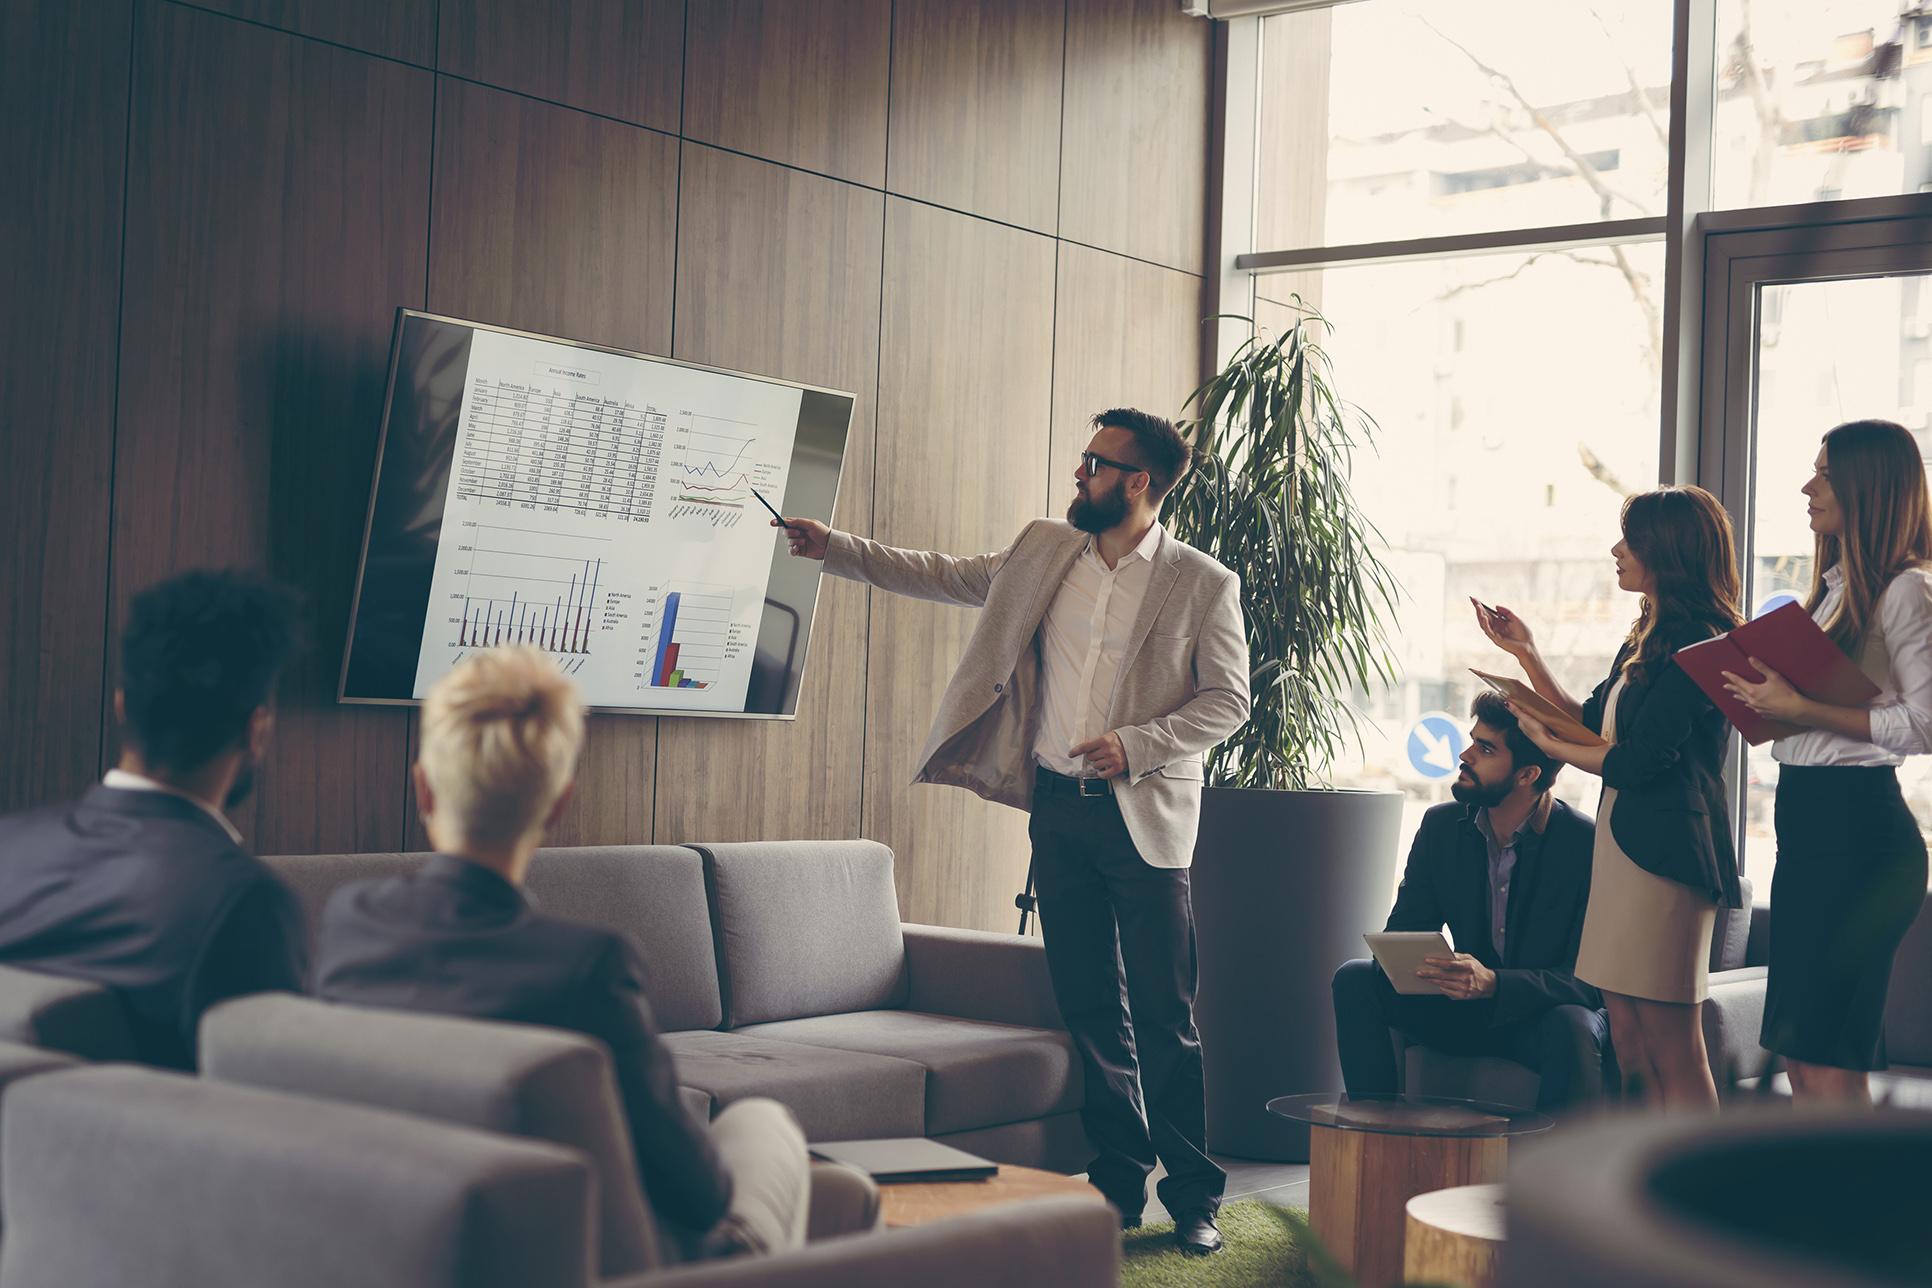 Business meeting discussing data analytics